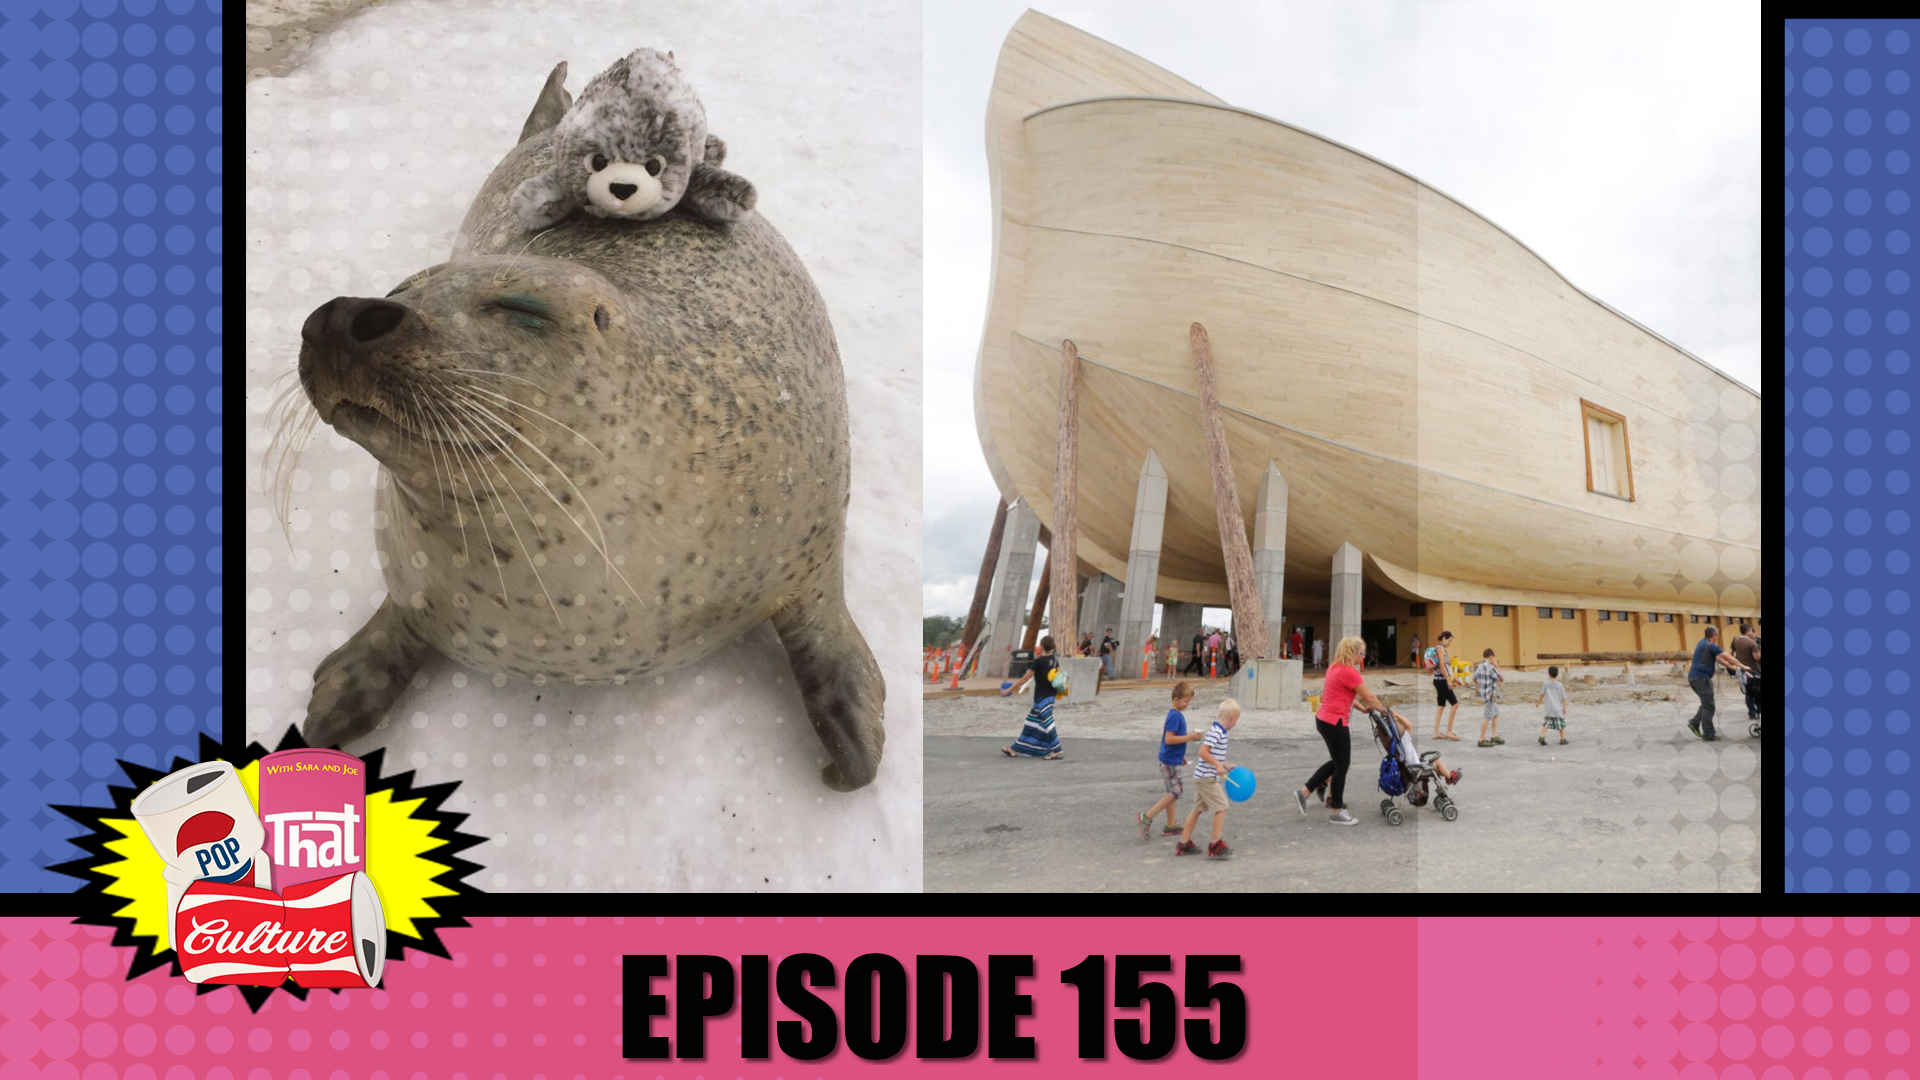 Pop That Culture - Episode 155